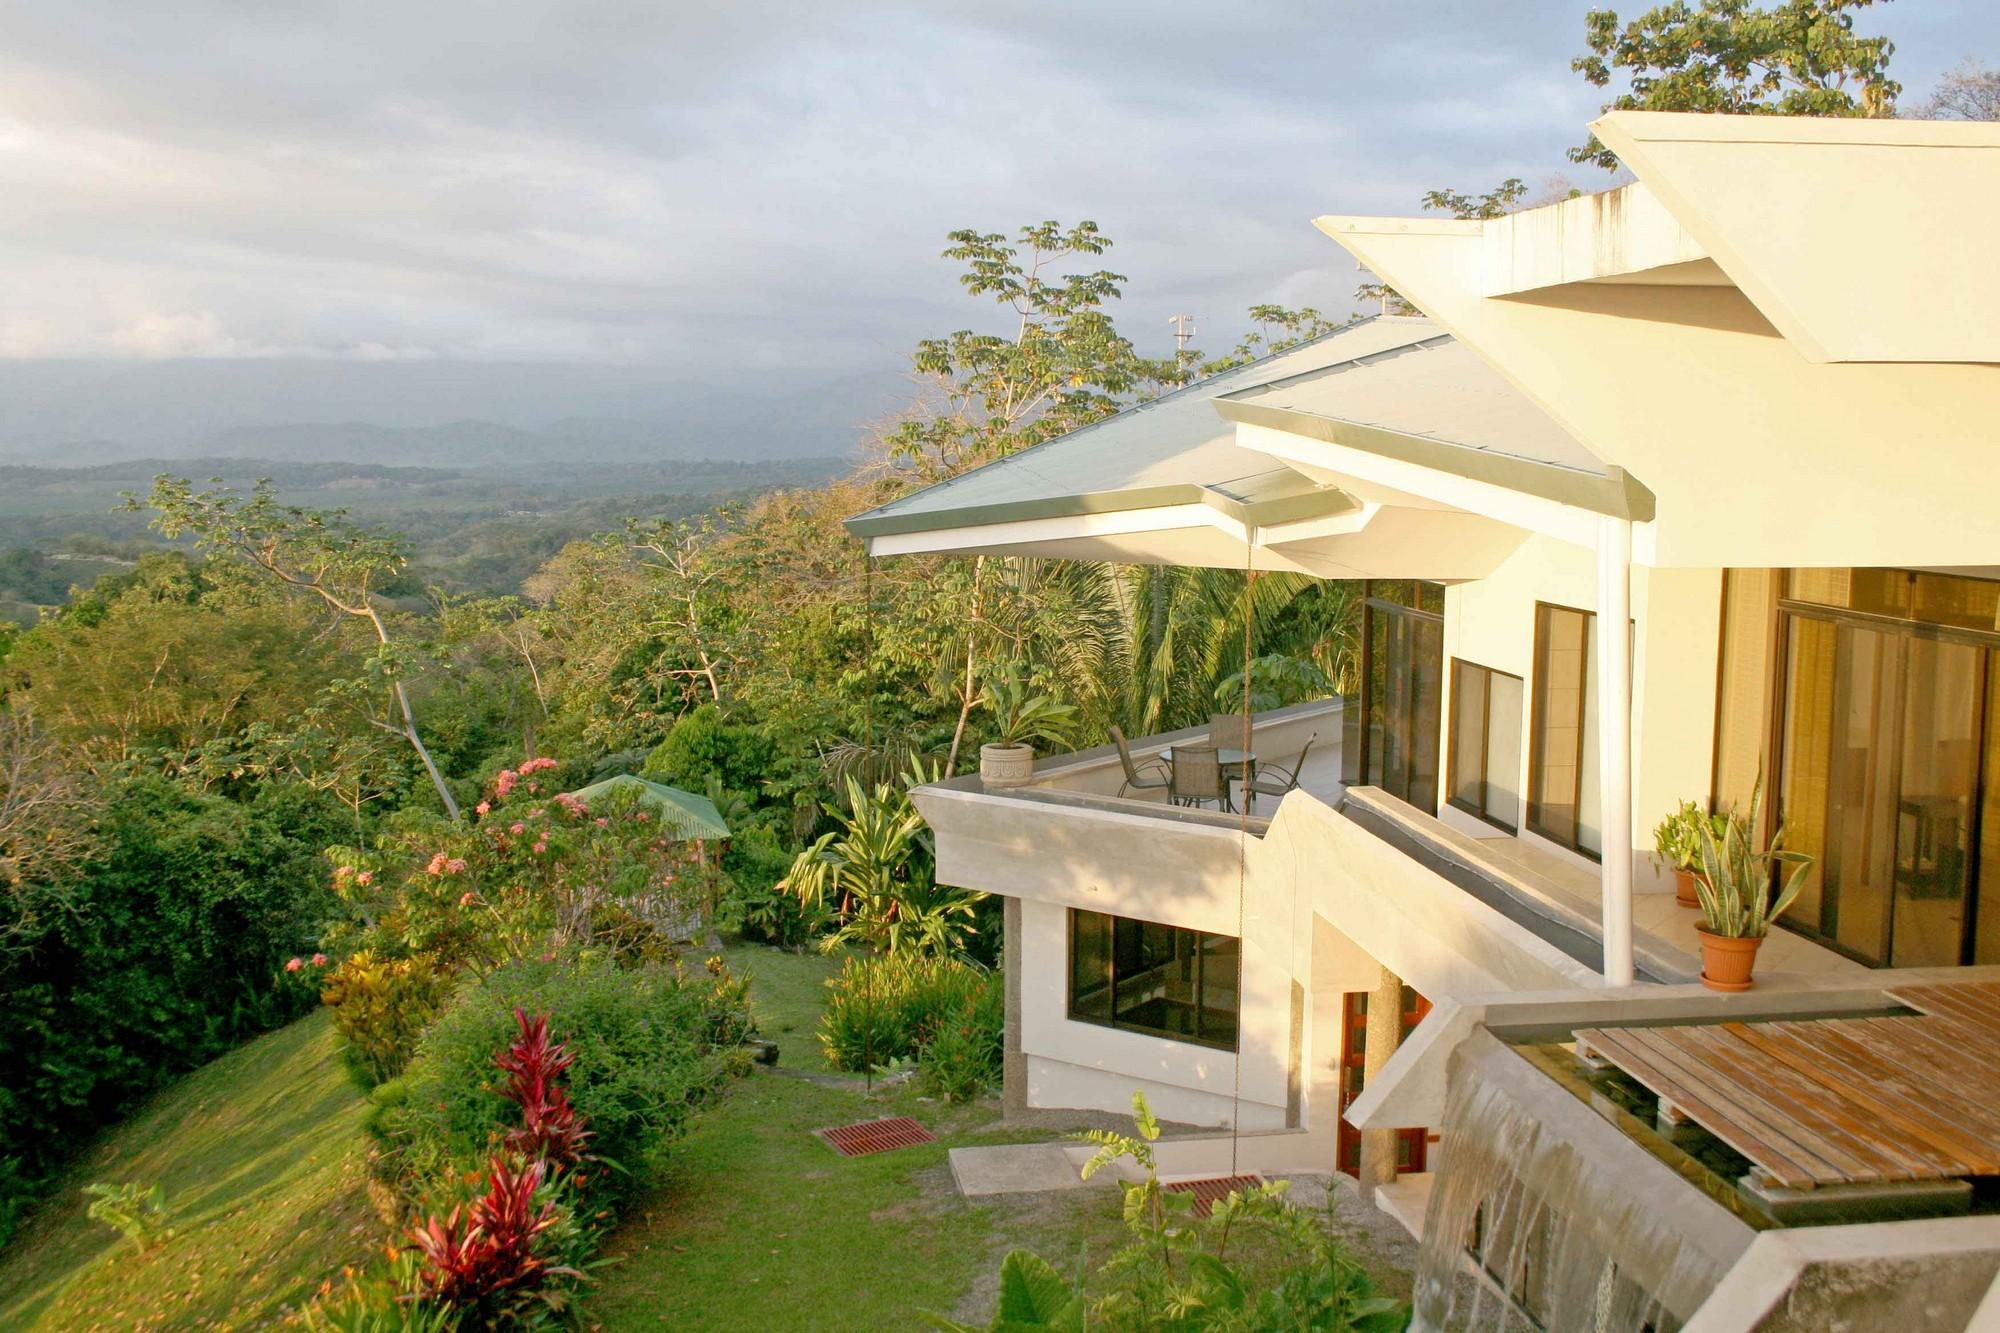 Casa de las Cascadas, Manuel Antonio, Costa Rica A great view of the Talamanca mountains.